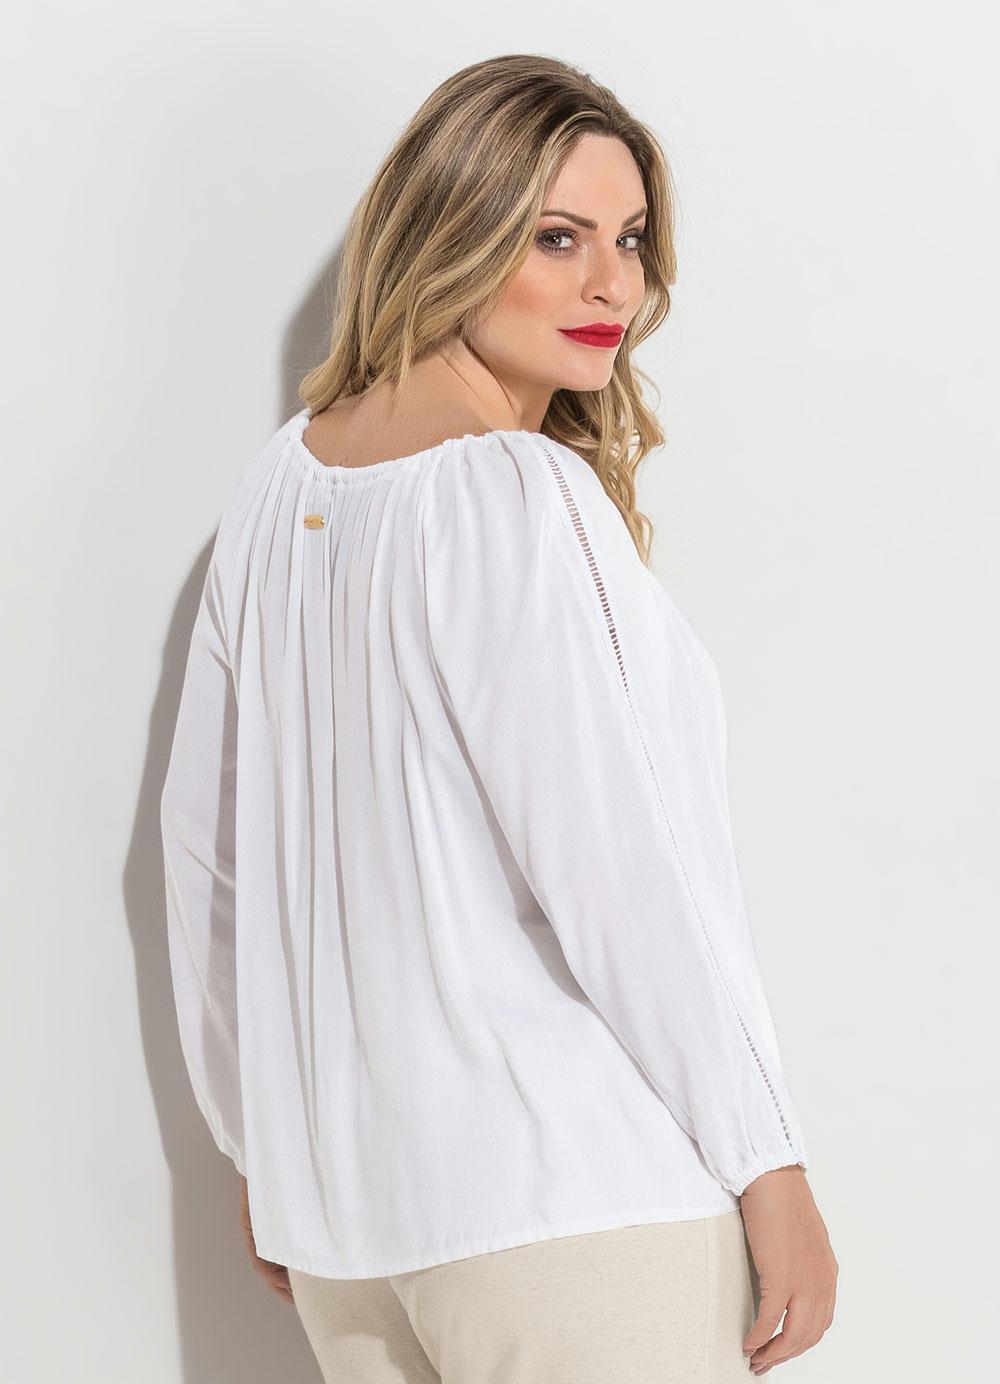 087fd25f9d Blusa Ombro a Ombro Branca Plus Size Quintess - Quintess